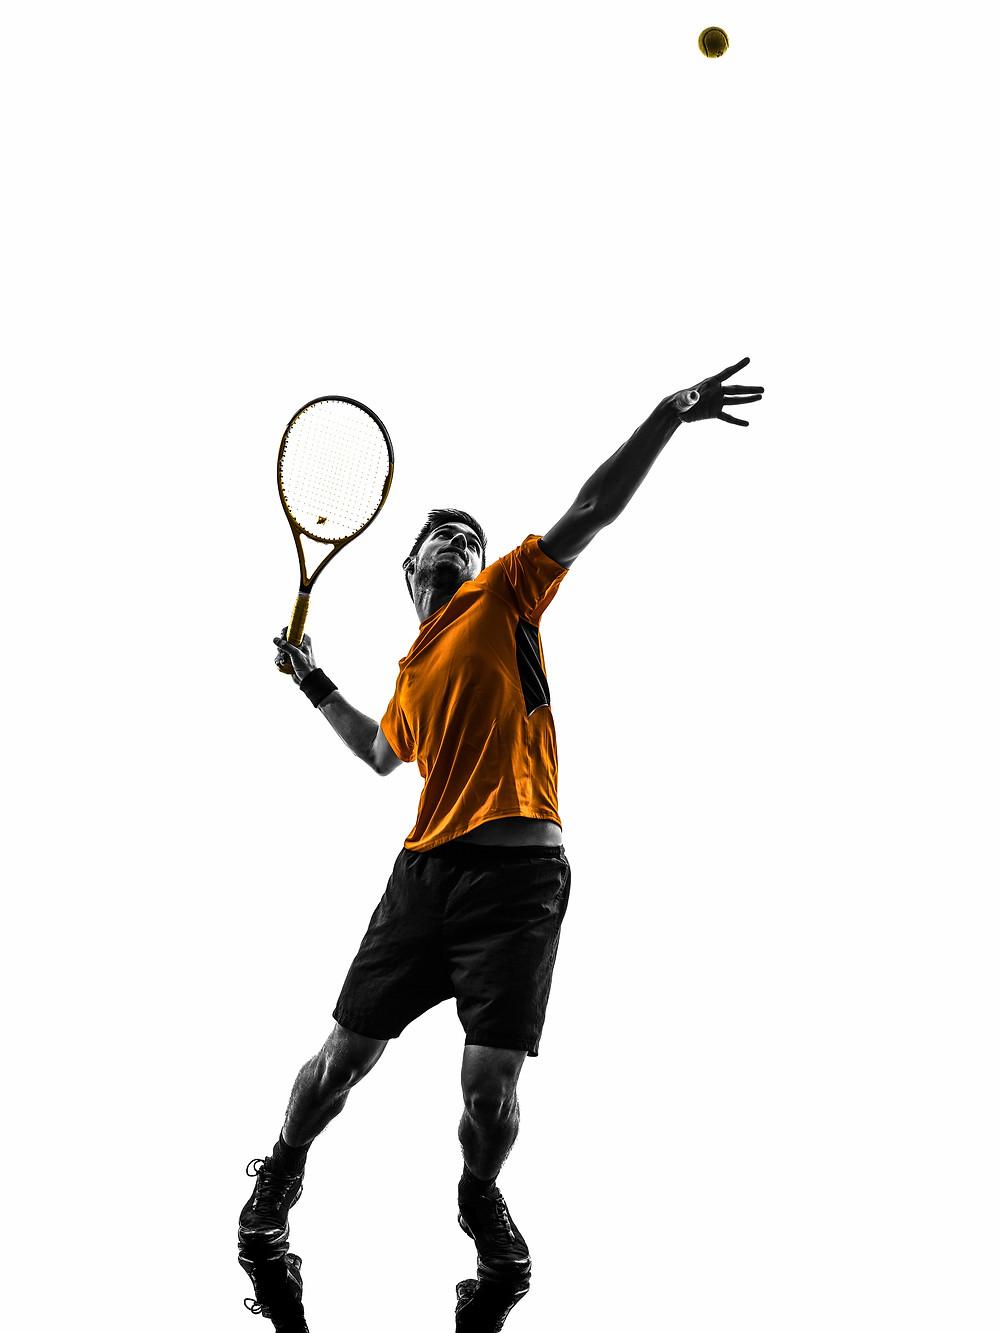 Conseils d'un physio: tennis